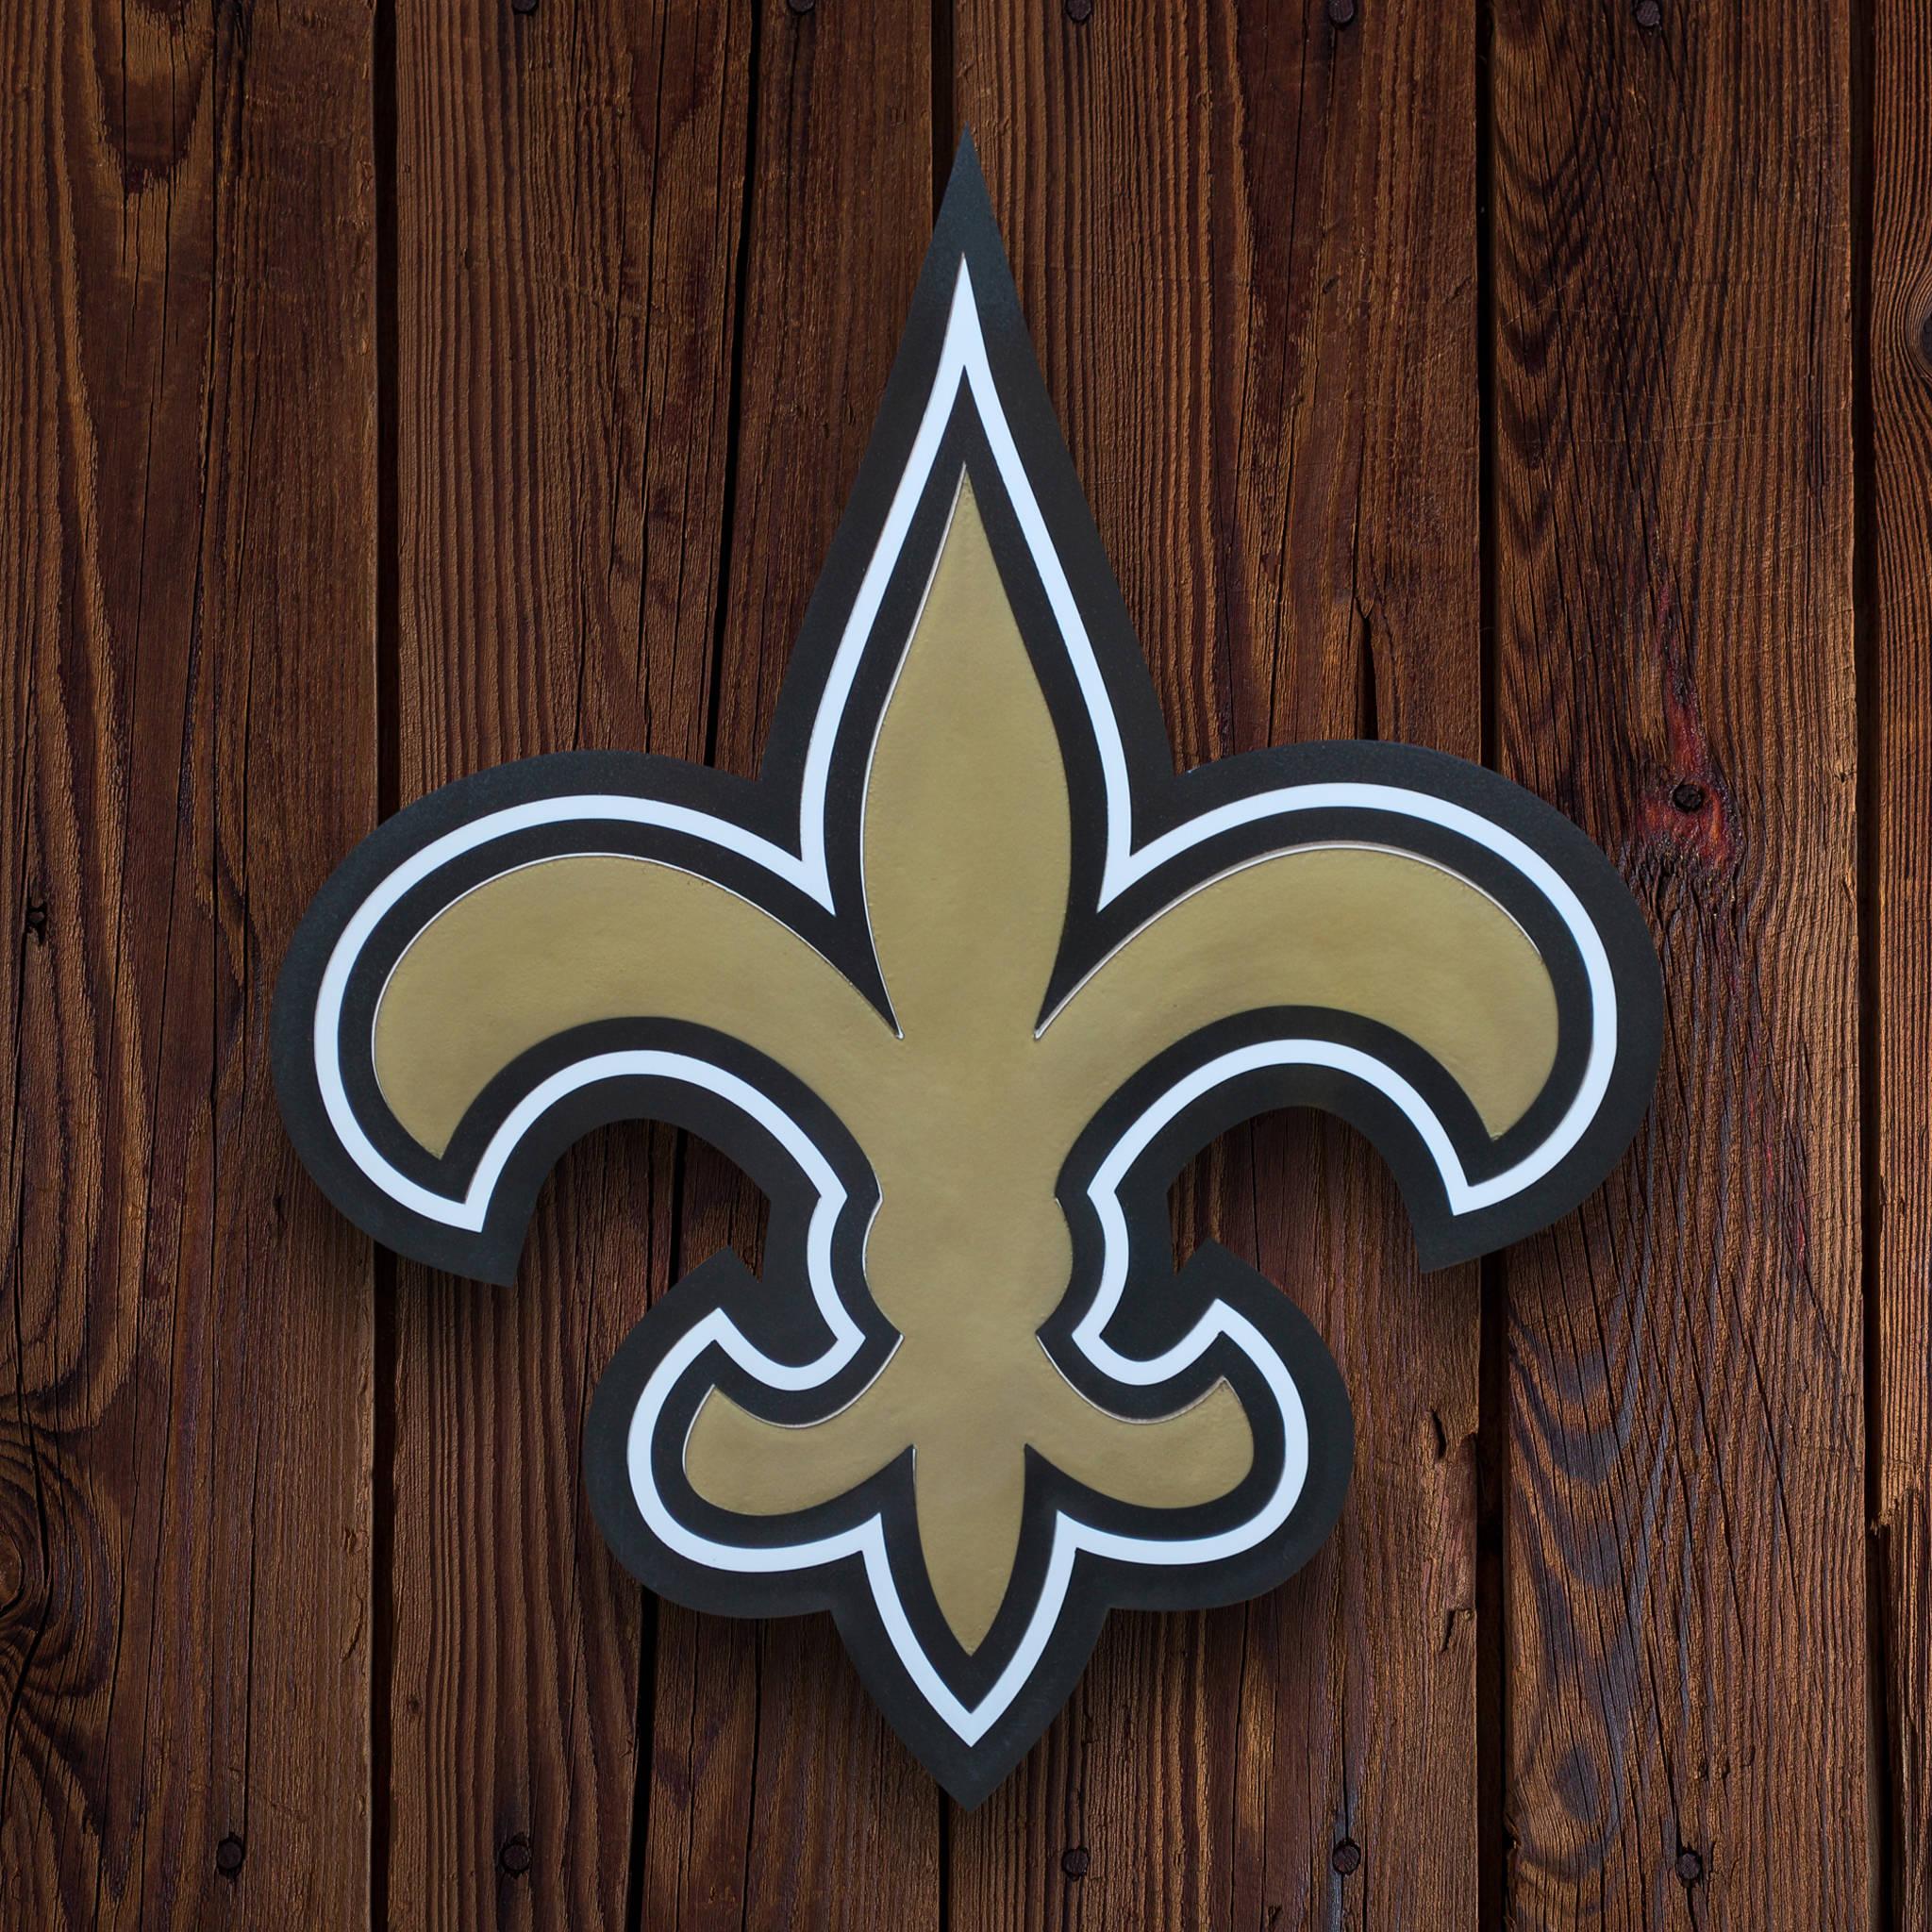 New Orleans Saints Decor|Wall Decor|Boy Room Decor|Boy Football ...